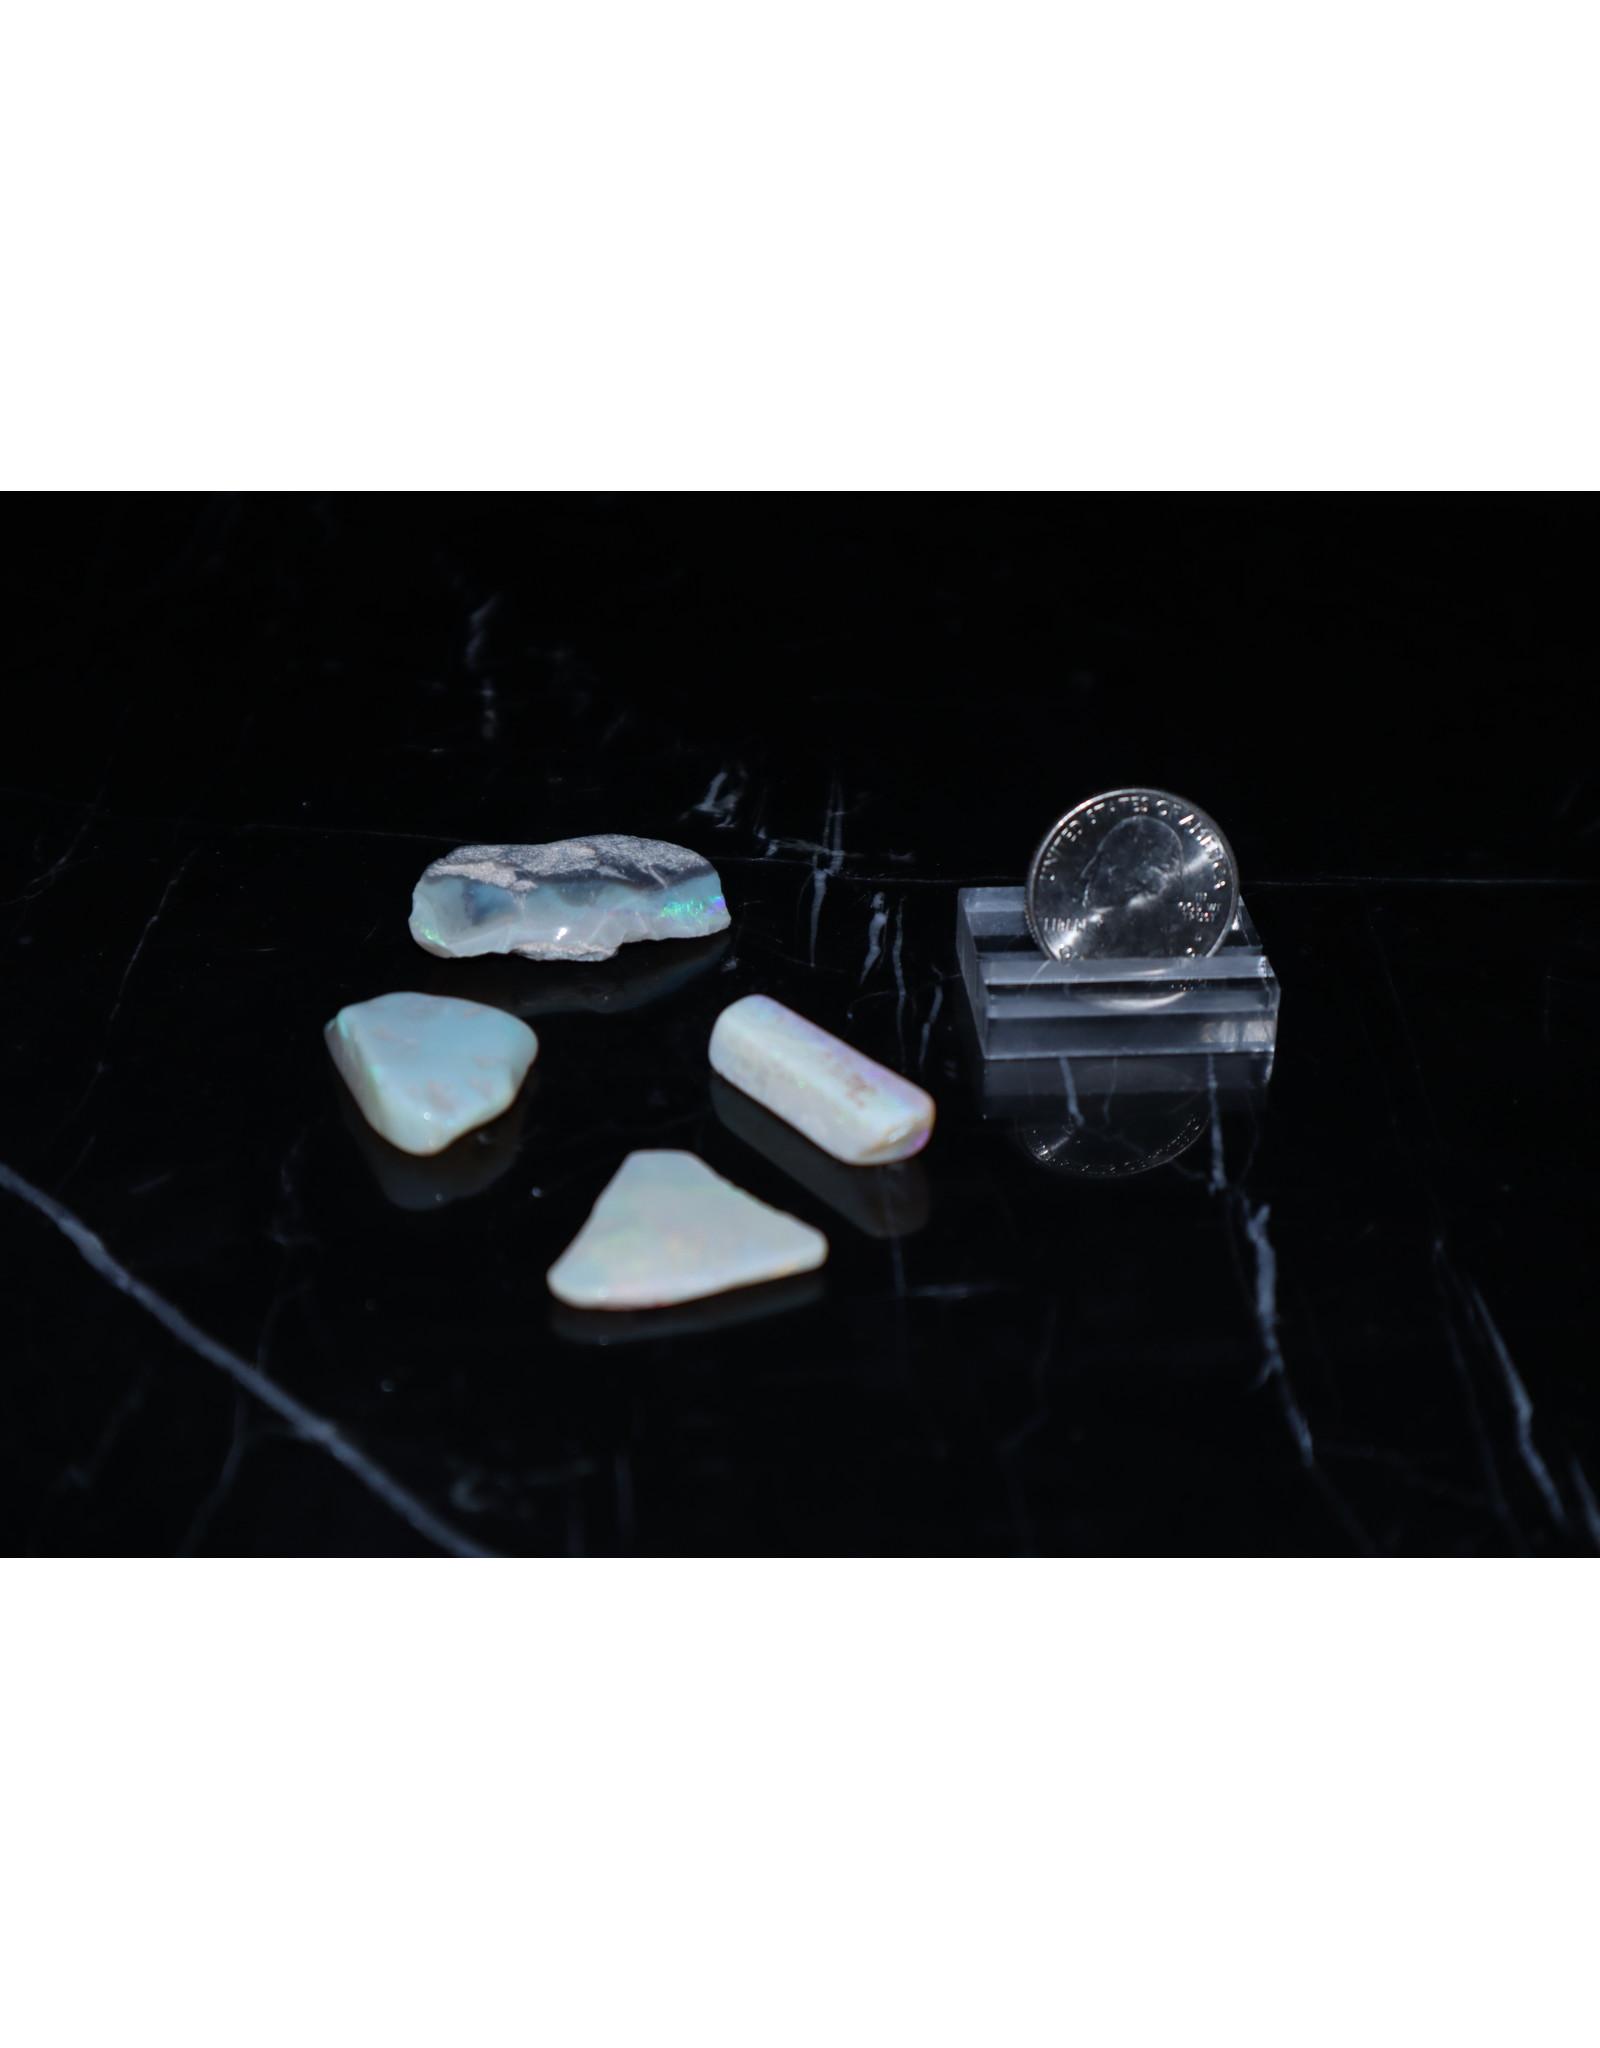 Australian Opal - Tumbled